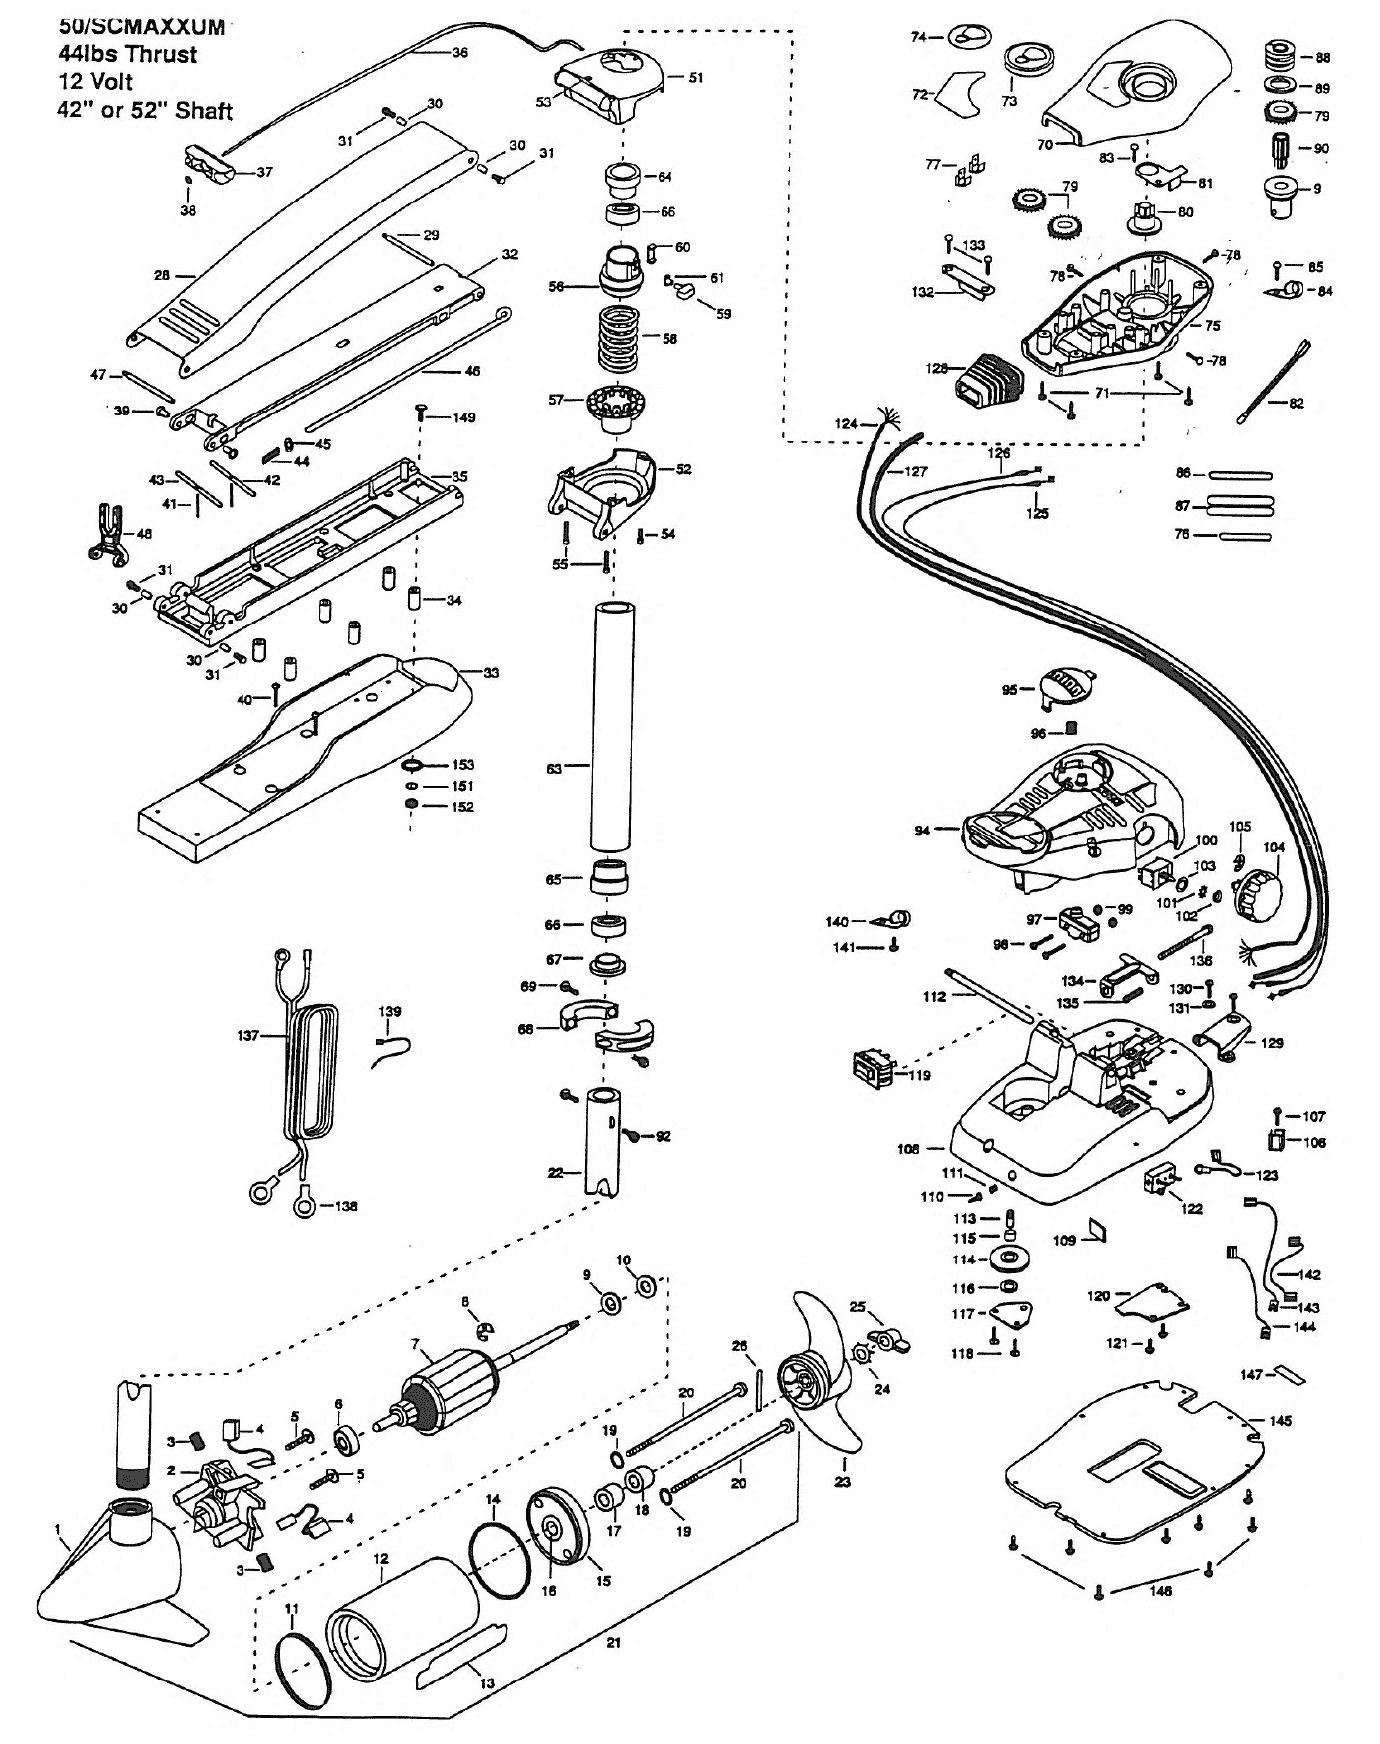 minn kota edge 70 wiring diagram wiring diagram automotive